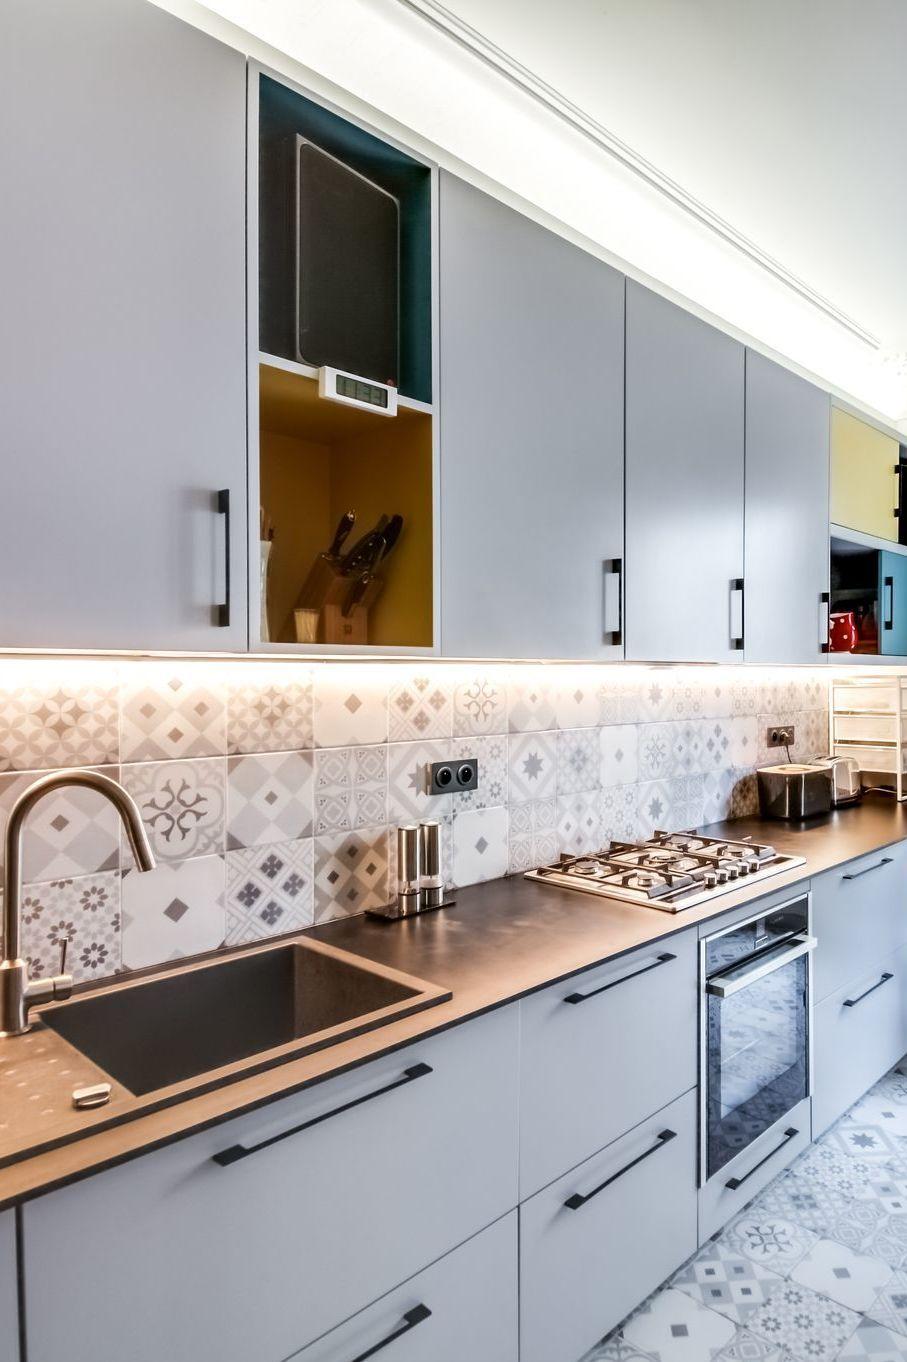 Cuisine Ikea Relookee Idees Pour La Personnaliser Faience